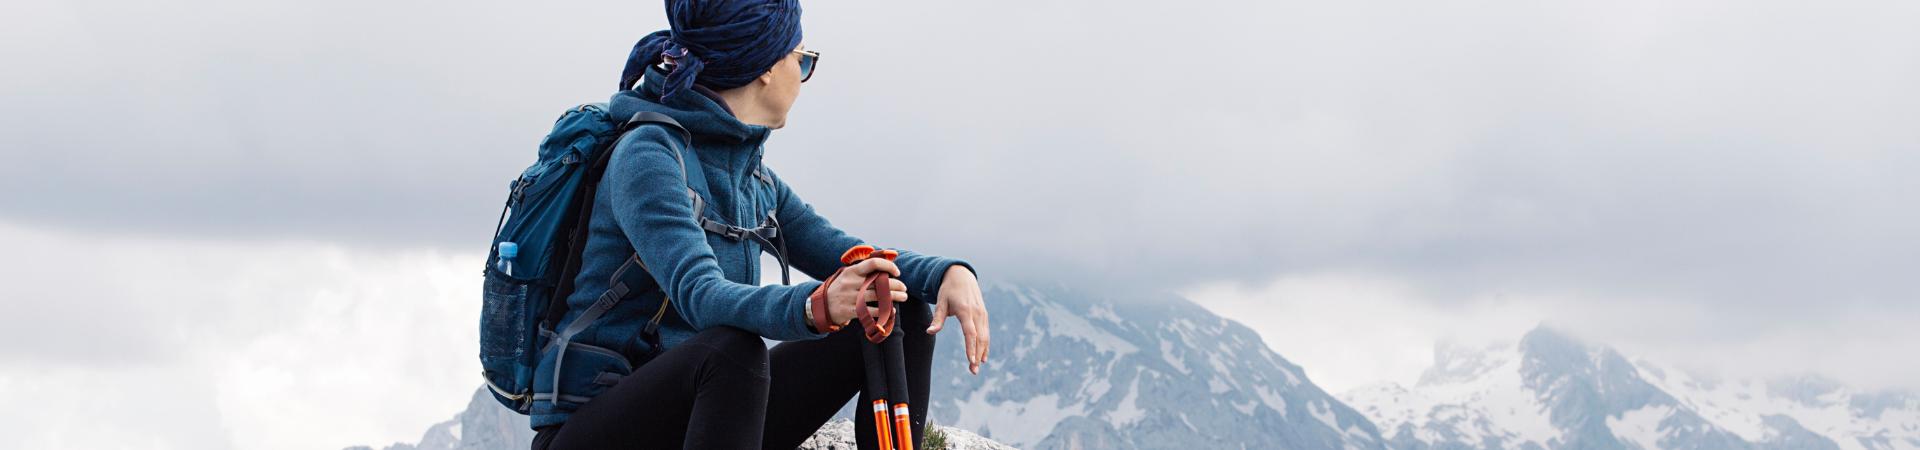 201911366 - Climb your mountain microschool